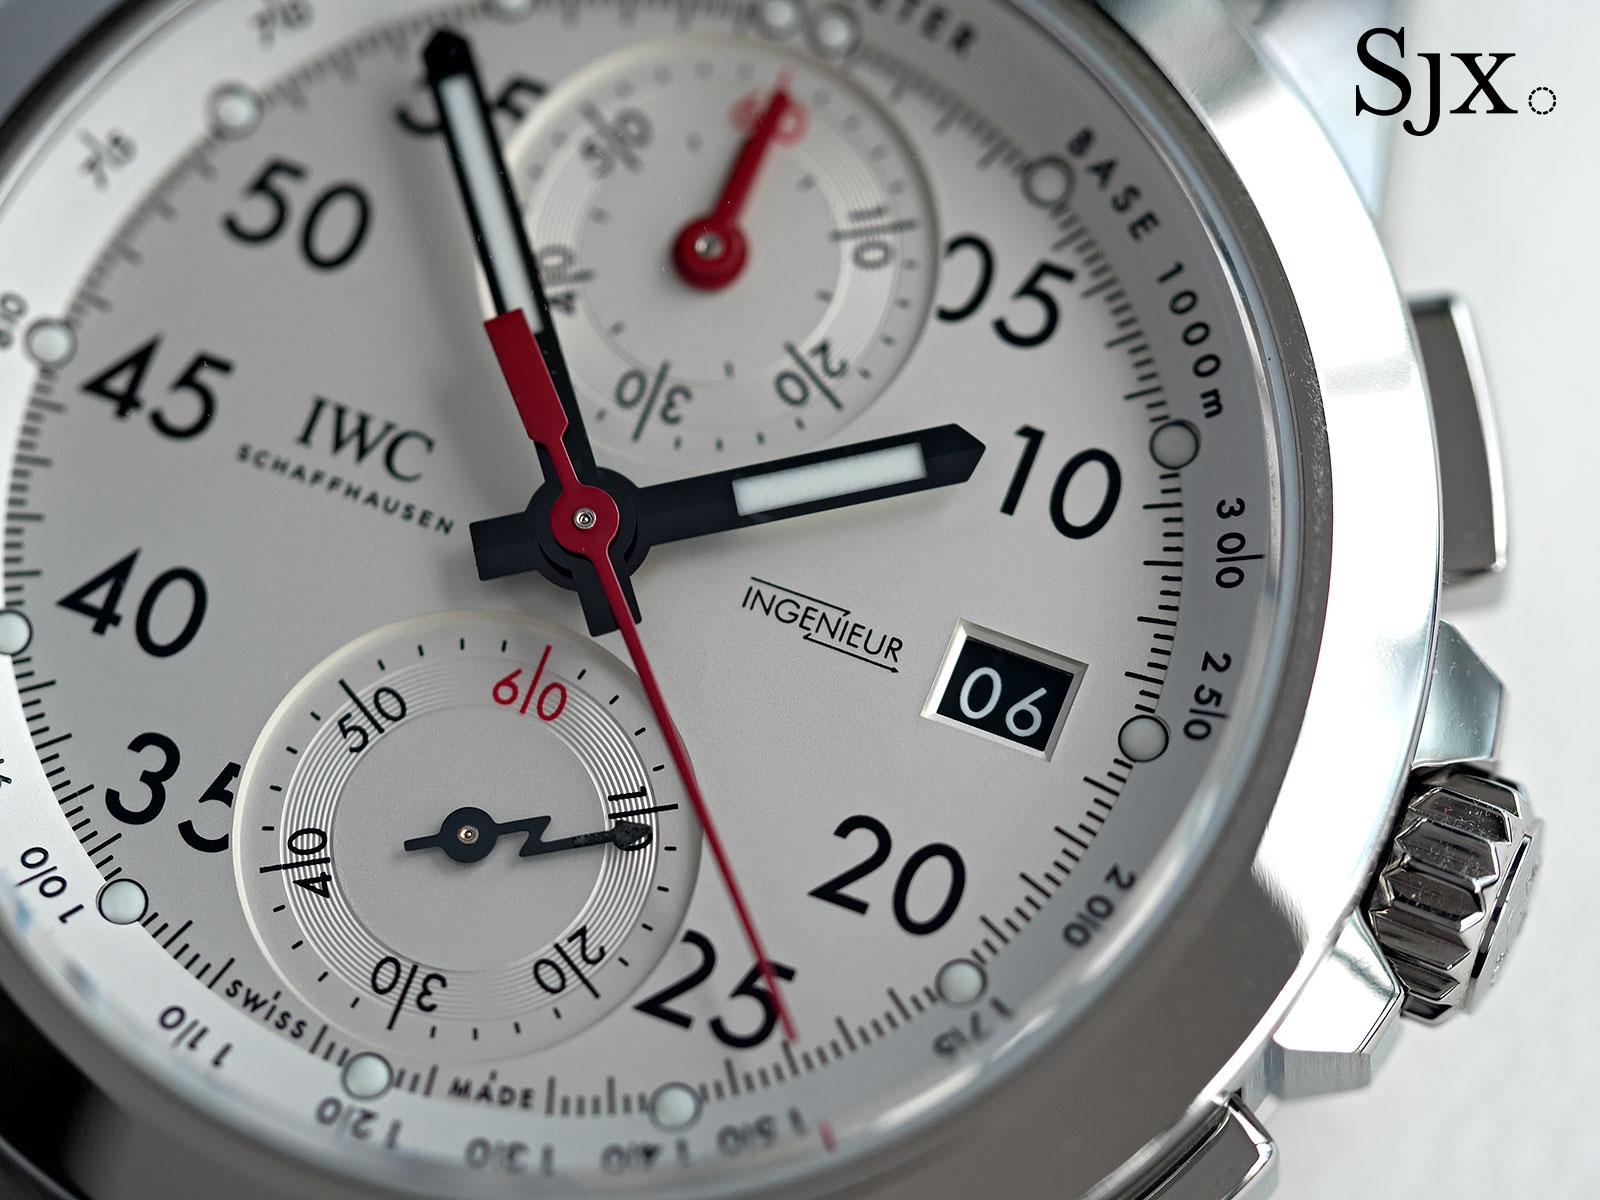 IWC Ingenieur Chronograph 50th Anniversary AMG 2